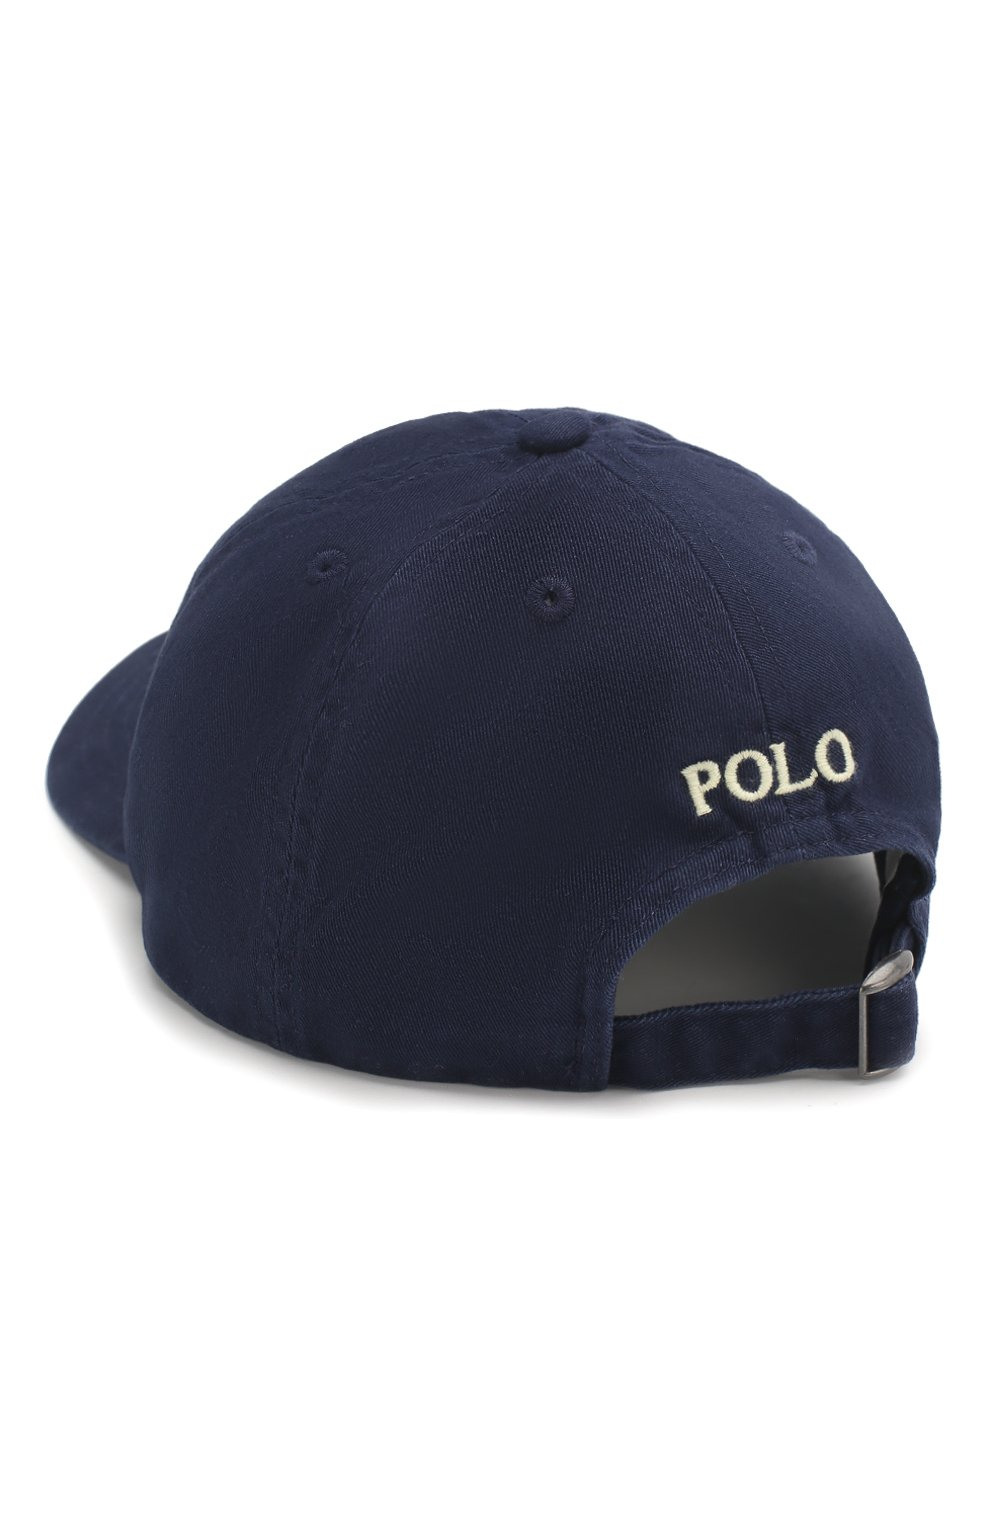 Бейсболка с логотипом бренда Polo Ralph Lauren синего цвета   Фото №2